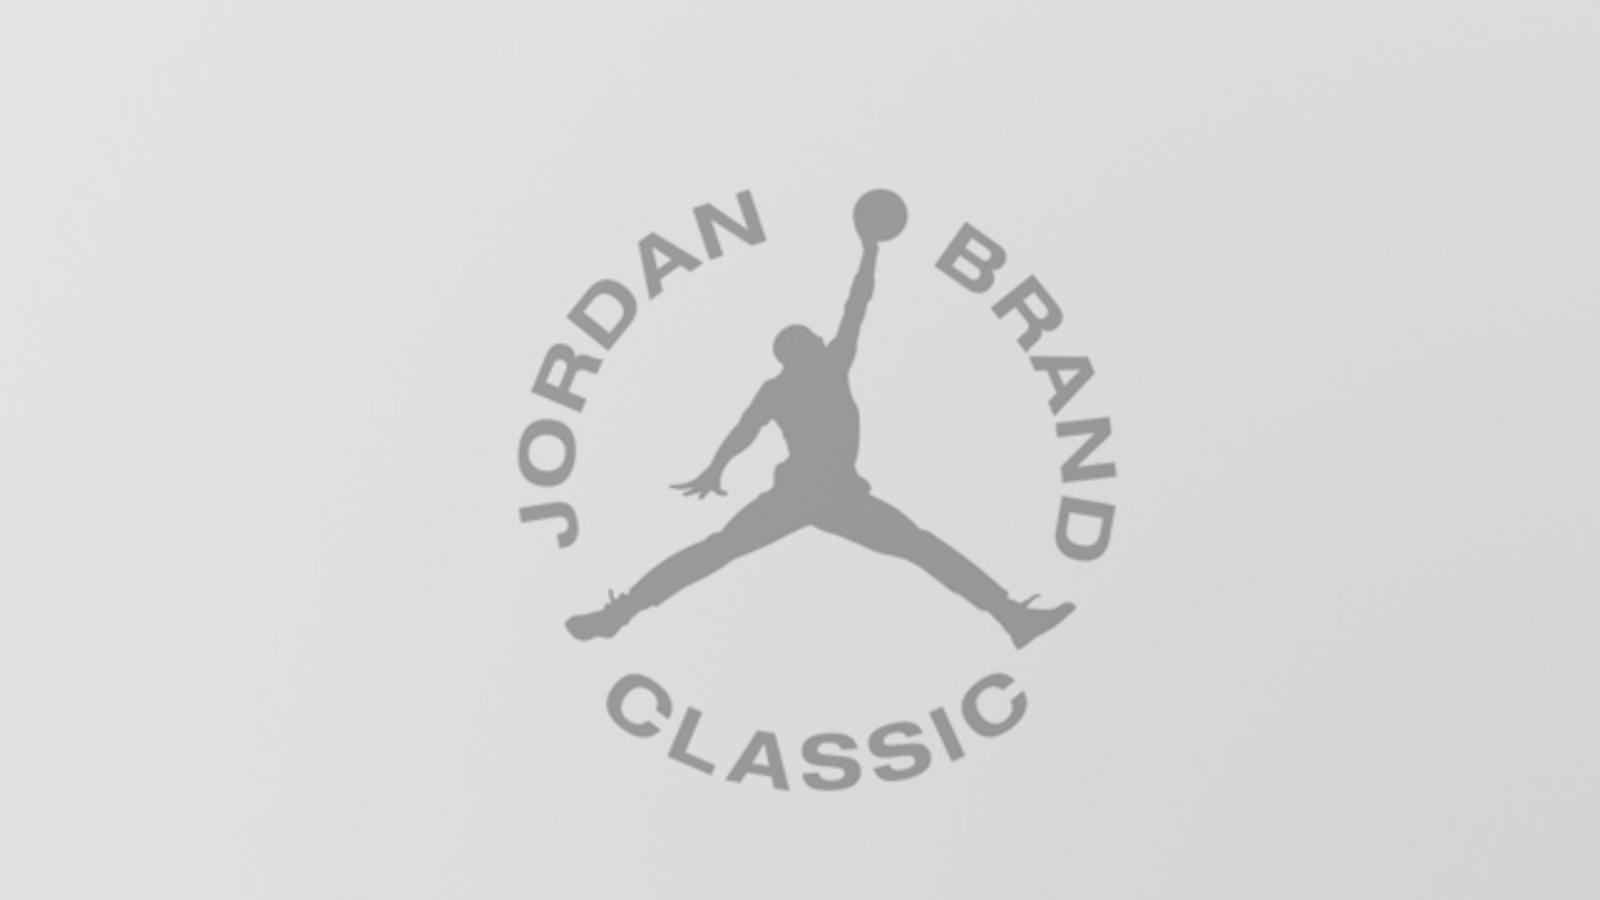 Jordan_Brand_Classic_original_(1)_copy